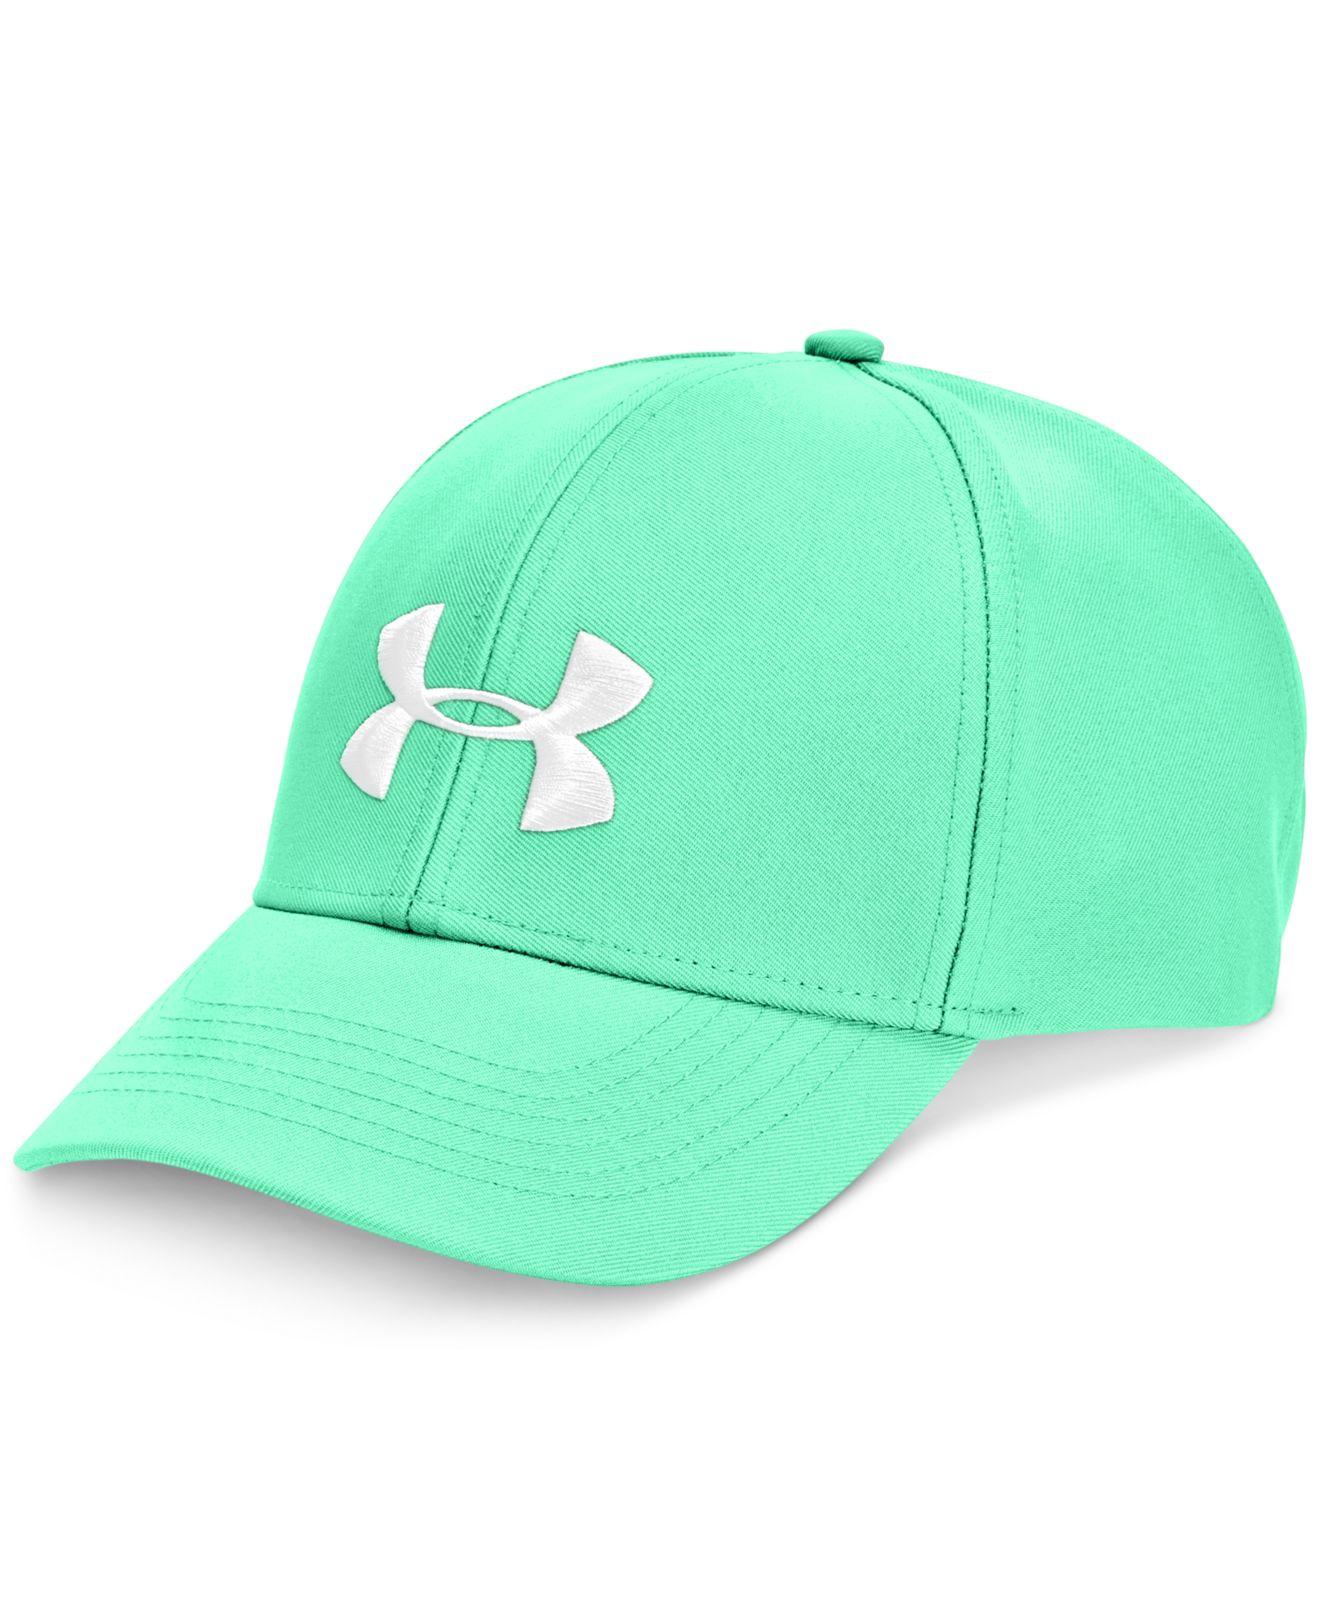 Lyst - Under Armour Adjustable-strap Cap in Green for Men 0f7821417de